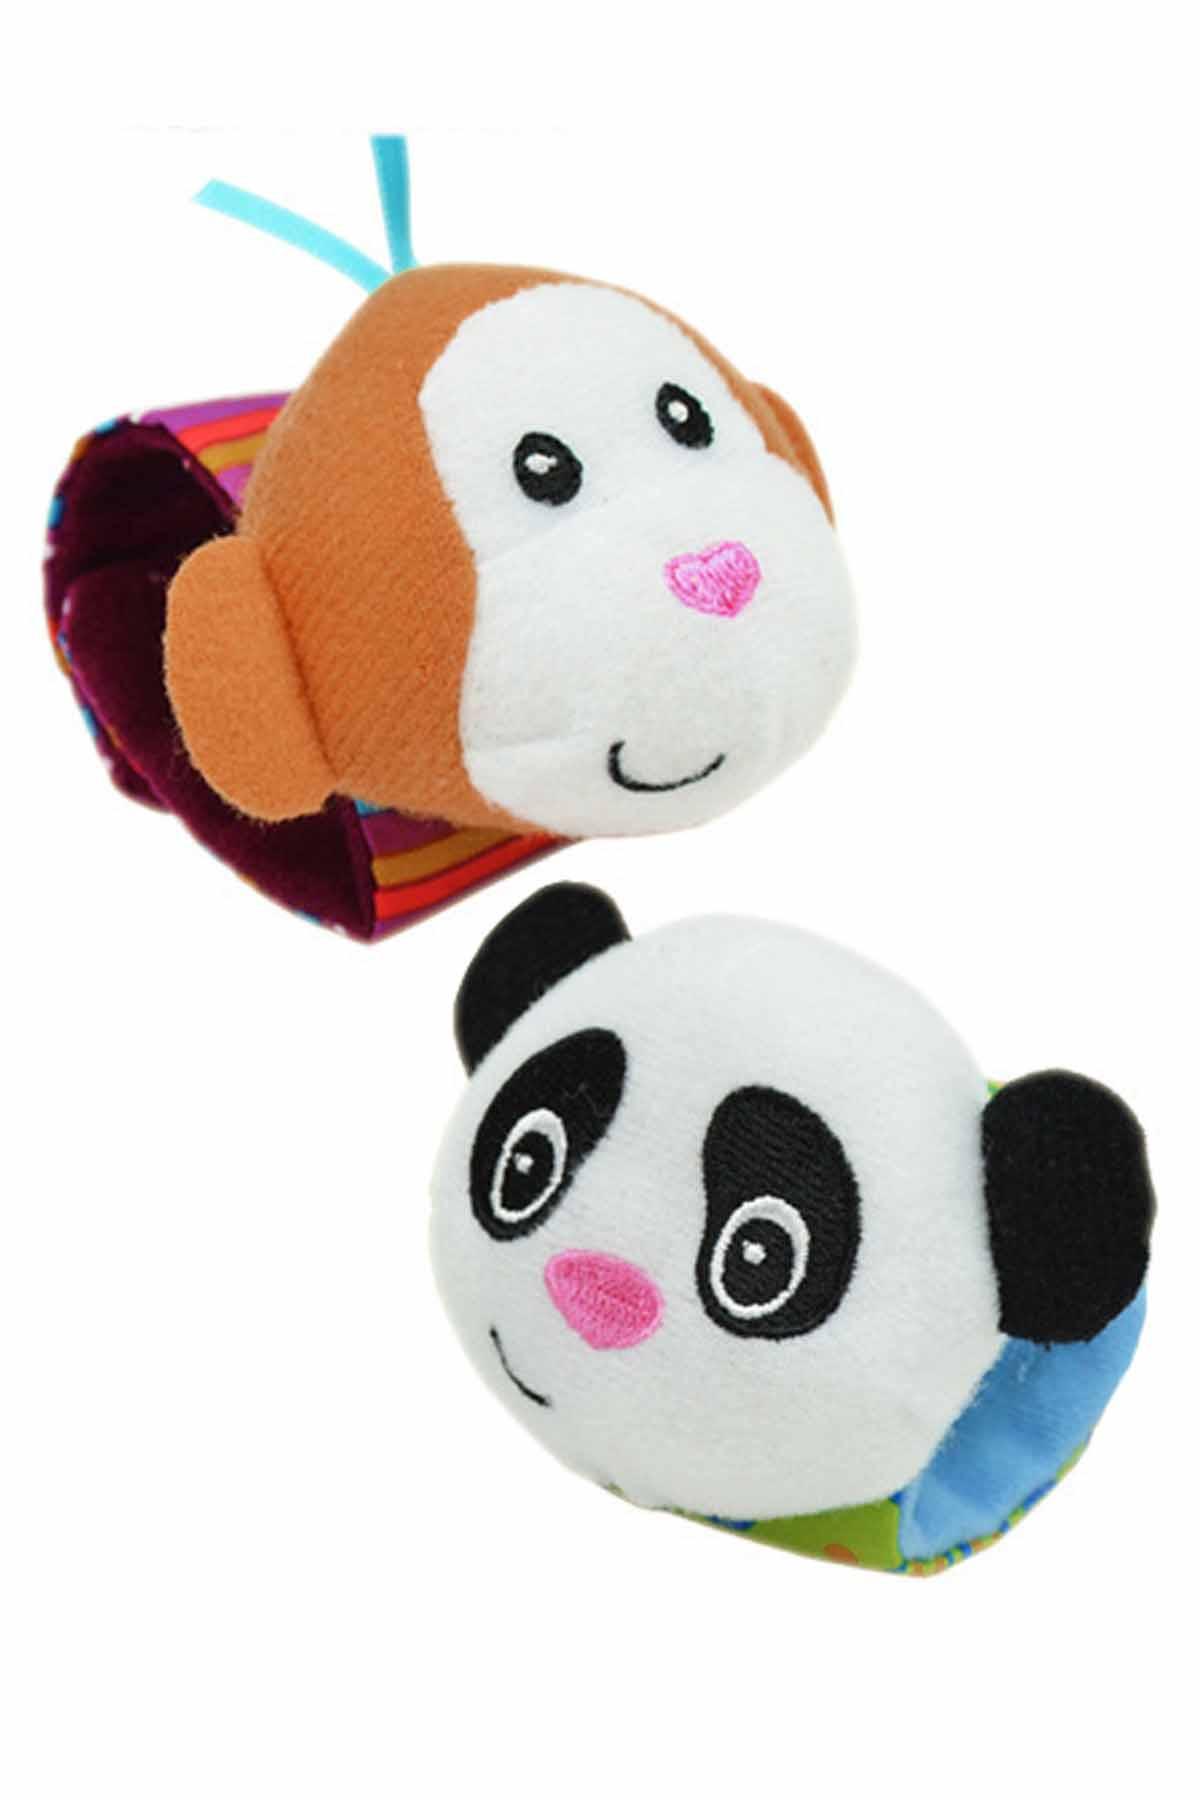 monkey and panda baby rattle wristba end 4 27 2020 2 10 pm